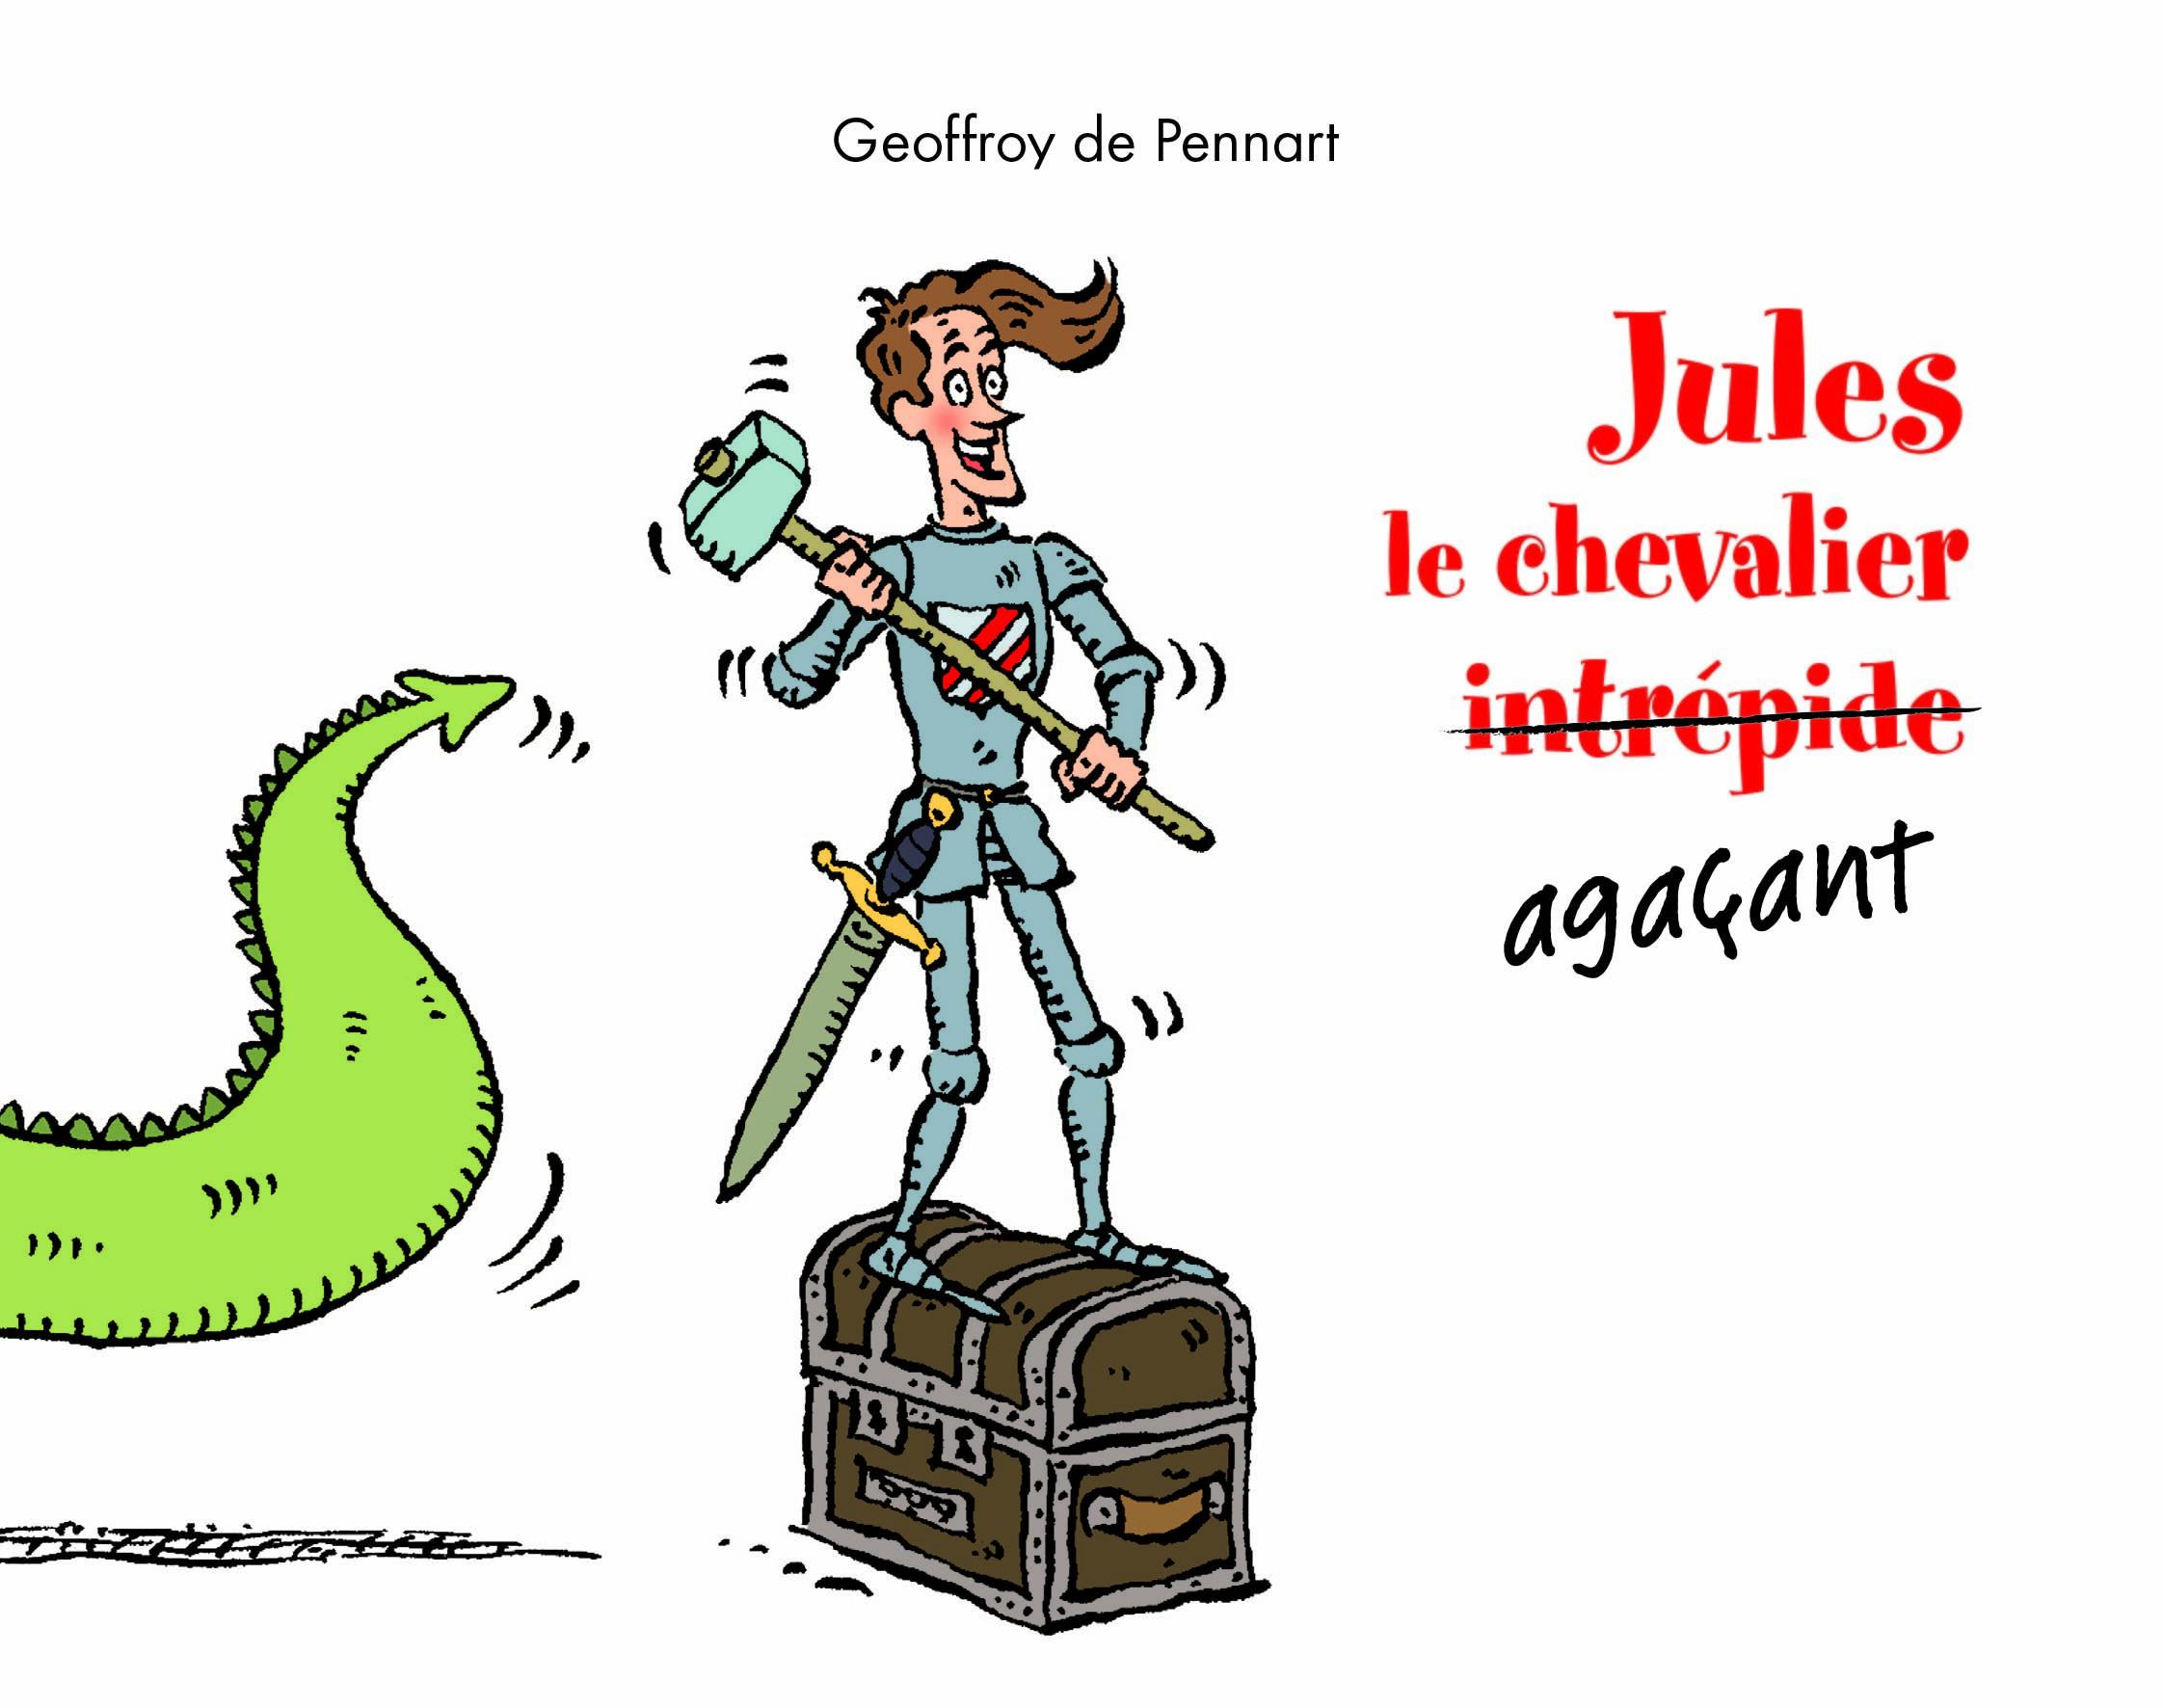 JULES LE CHEVALIER AGACANT